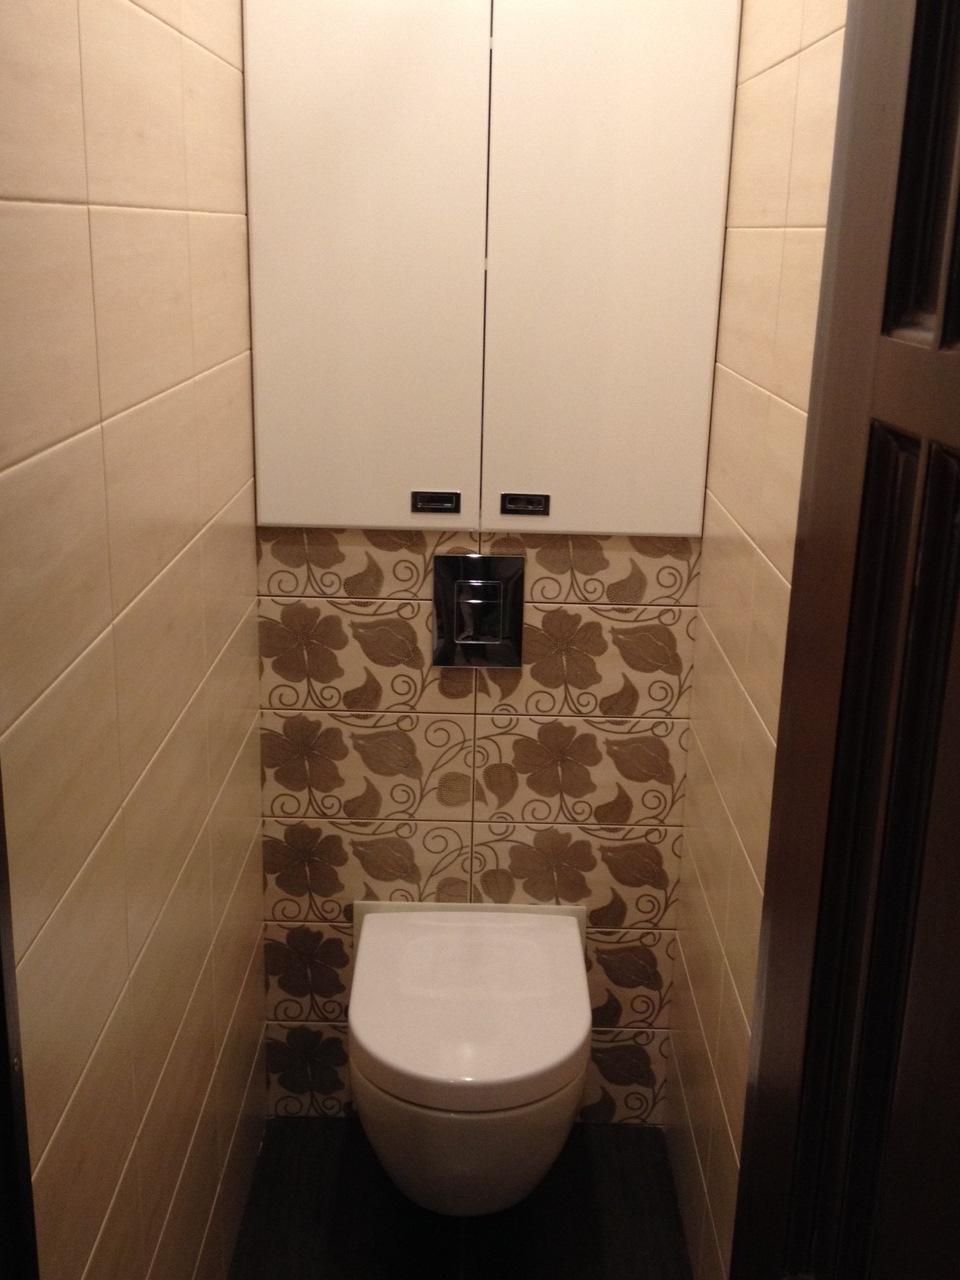 дизайн туалета маленького размера с водонагревателем фото